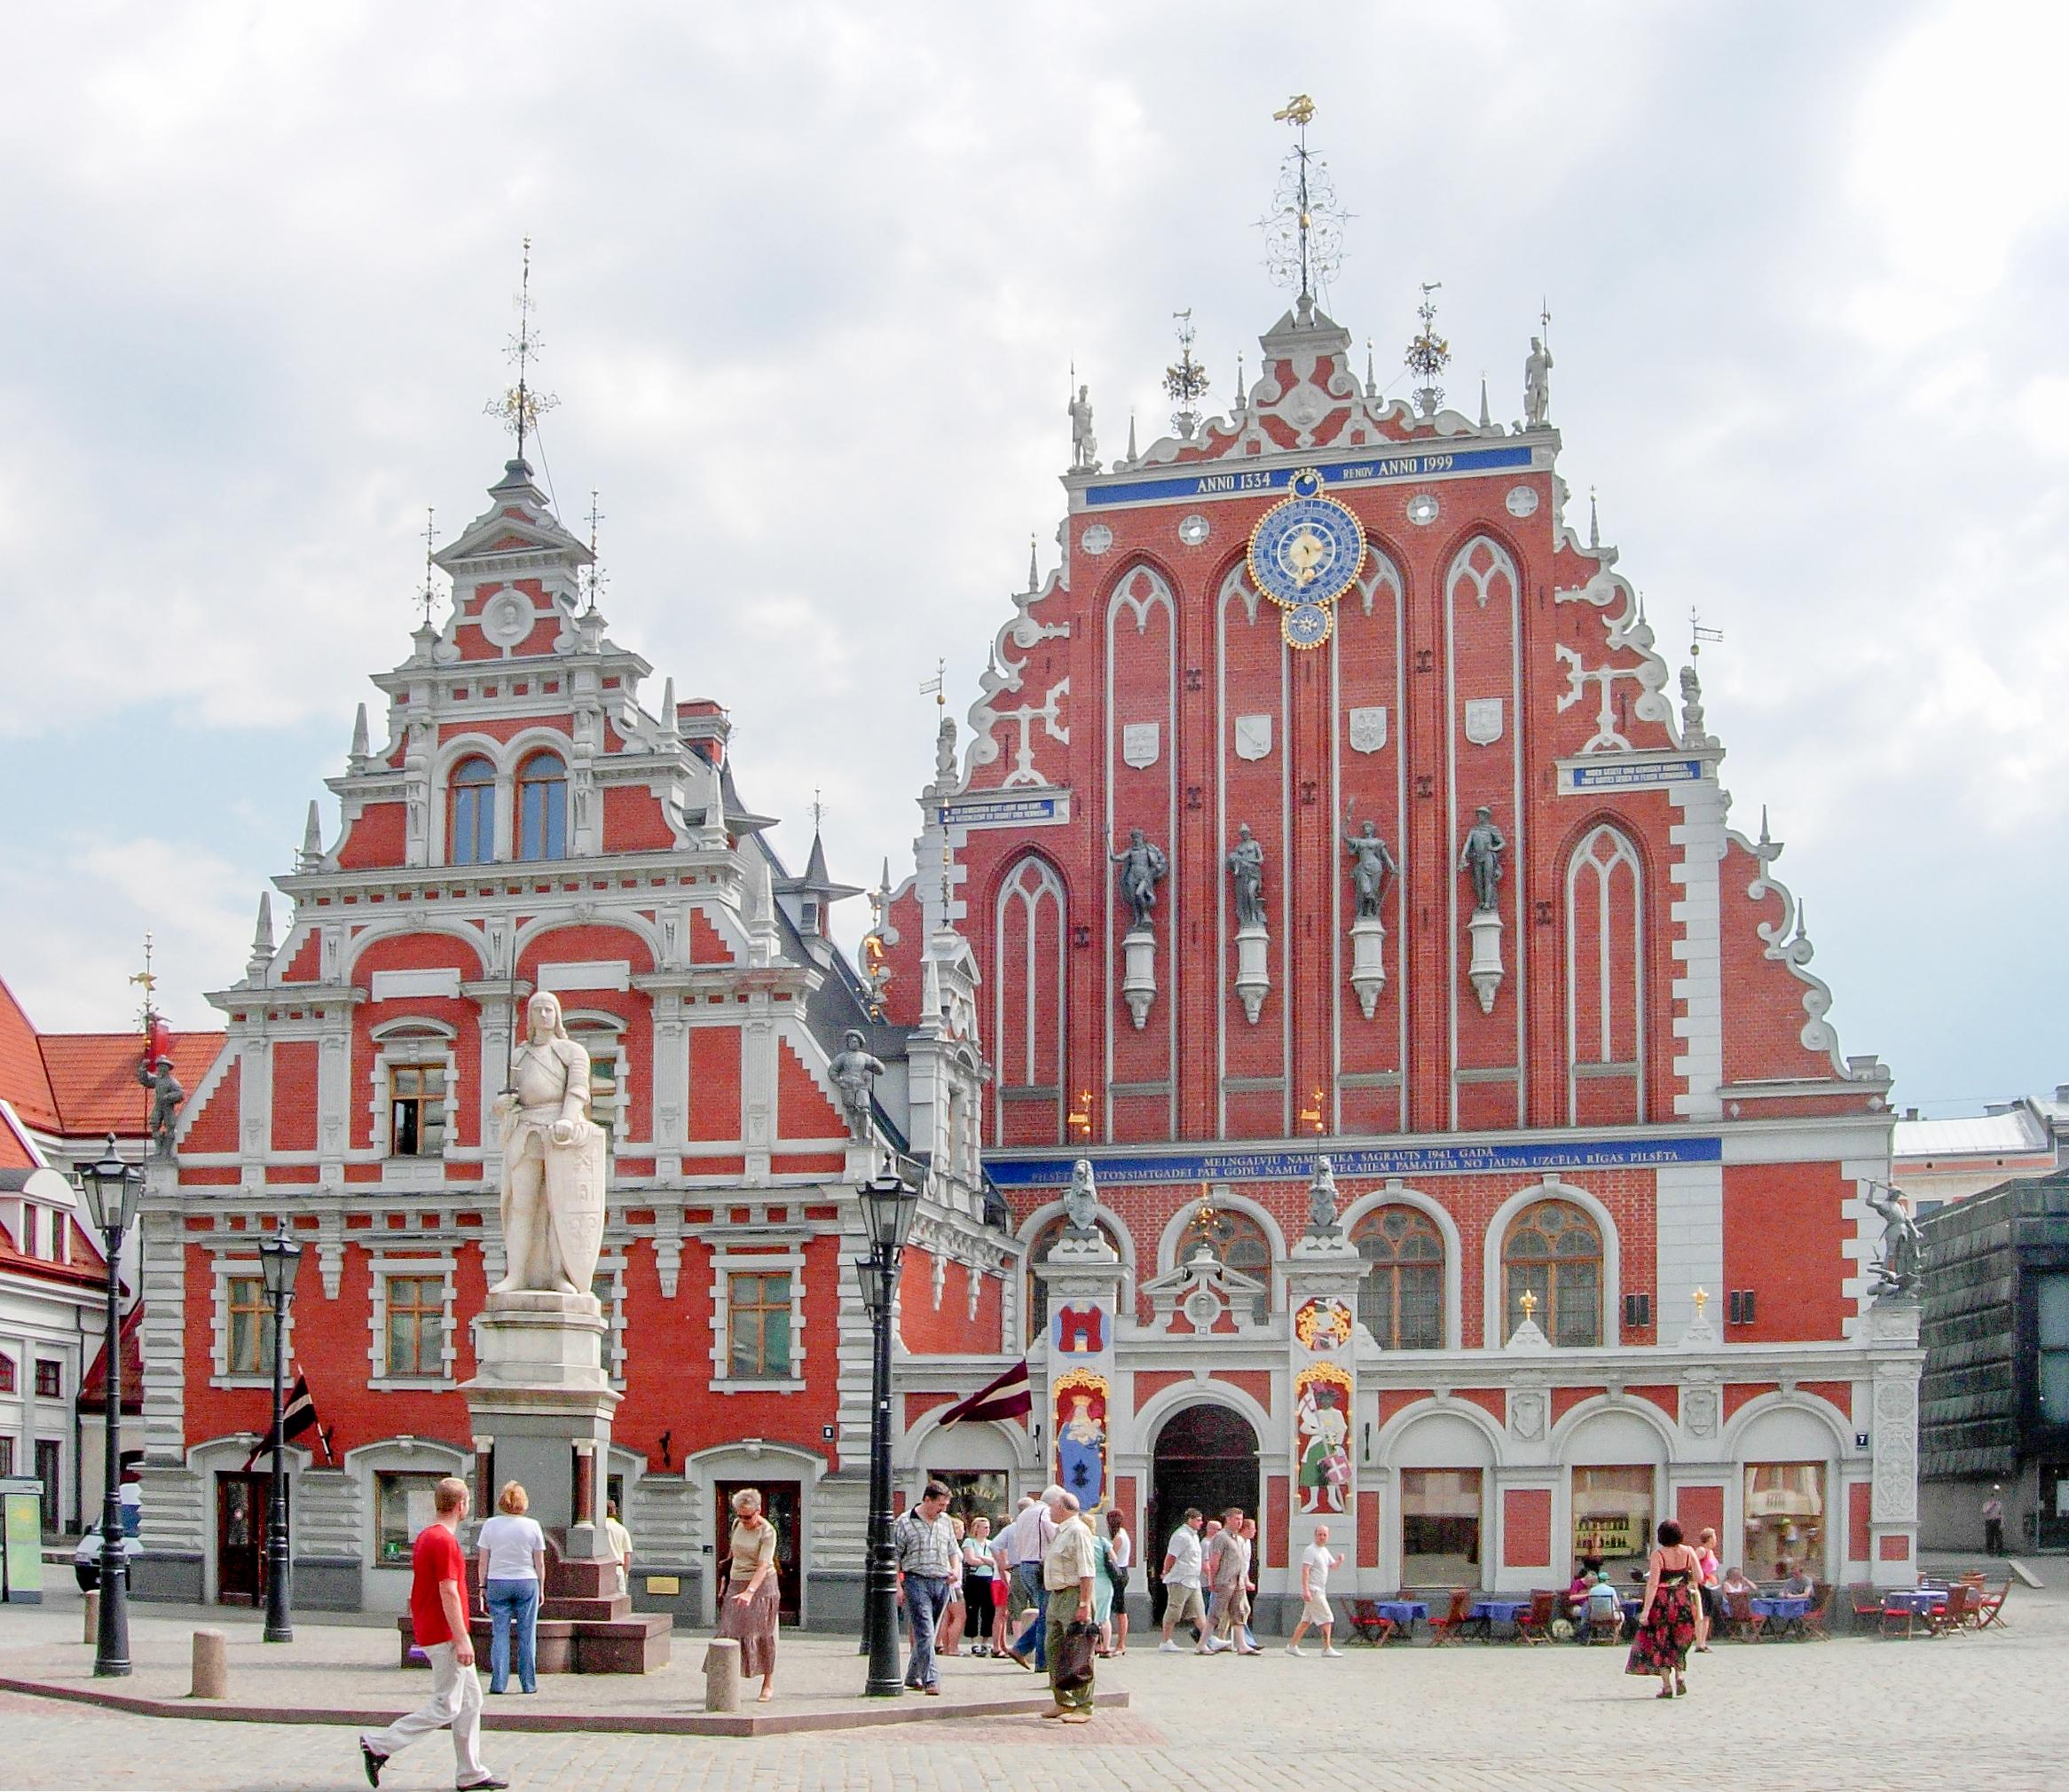 Riga, Latvia - Holiday Destinations - Leeds Bradford Airport